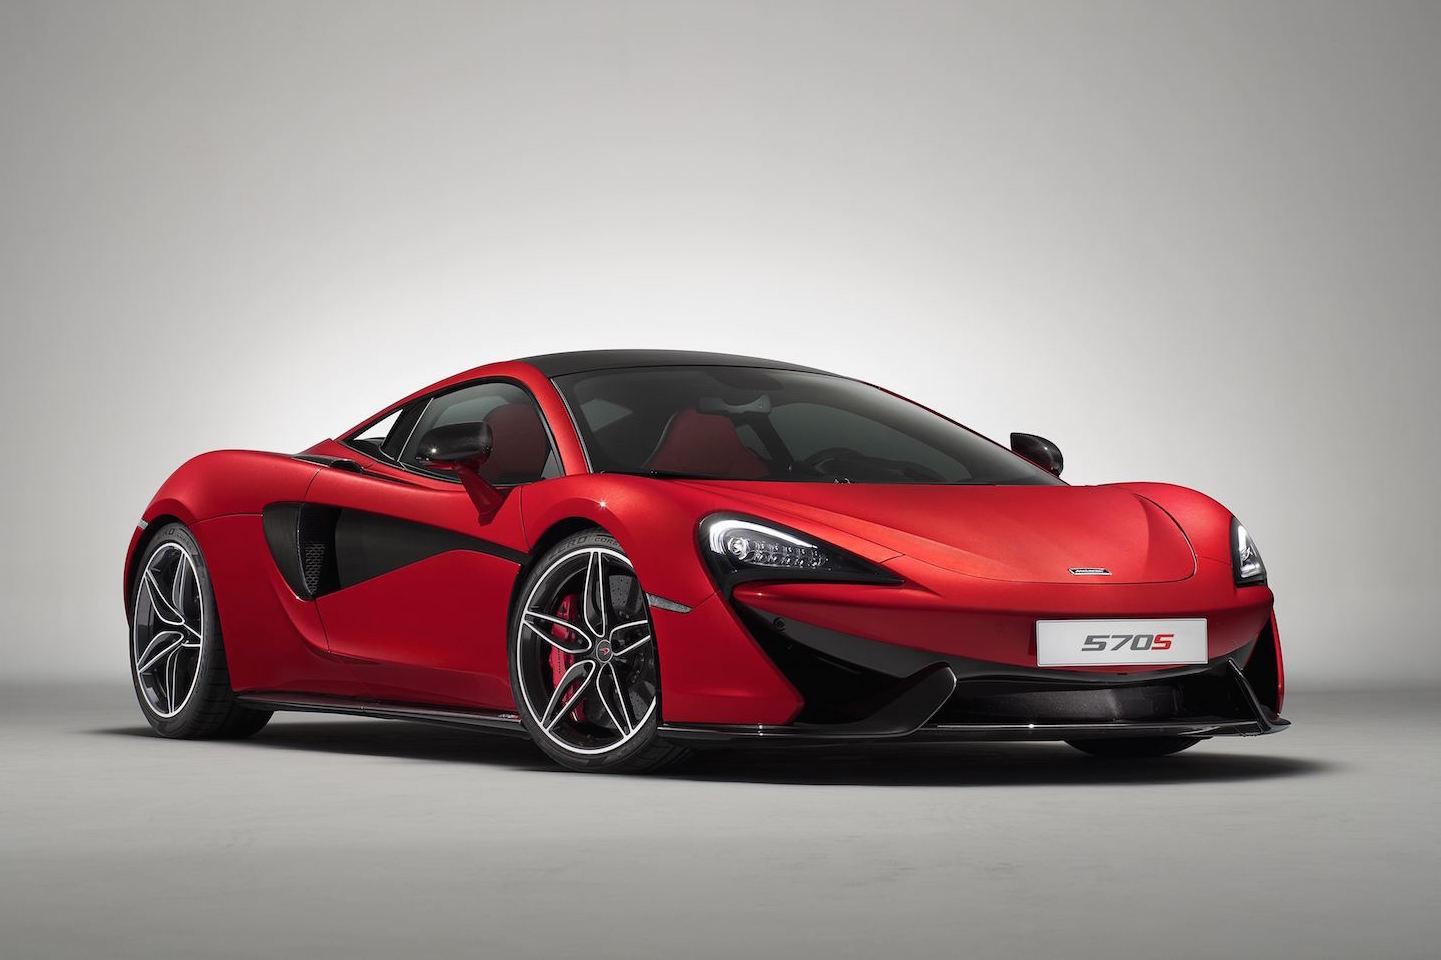 McLaren-570S-Design-Edition.jpg (1441×960)